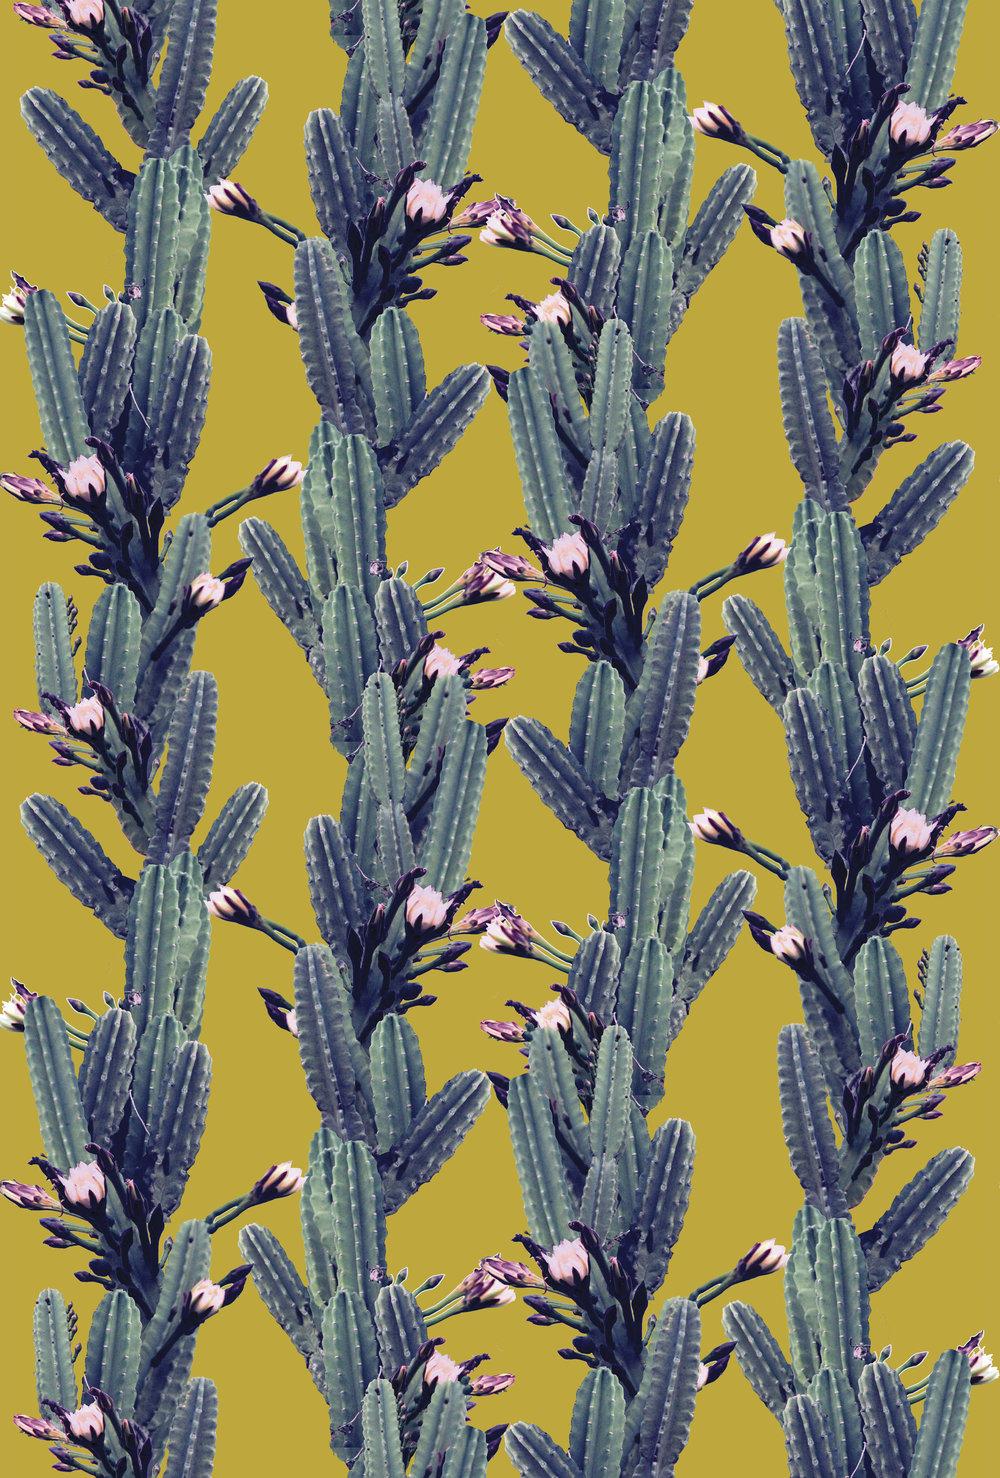 Cactus_Print_03.jpg